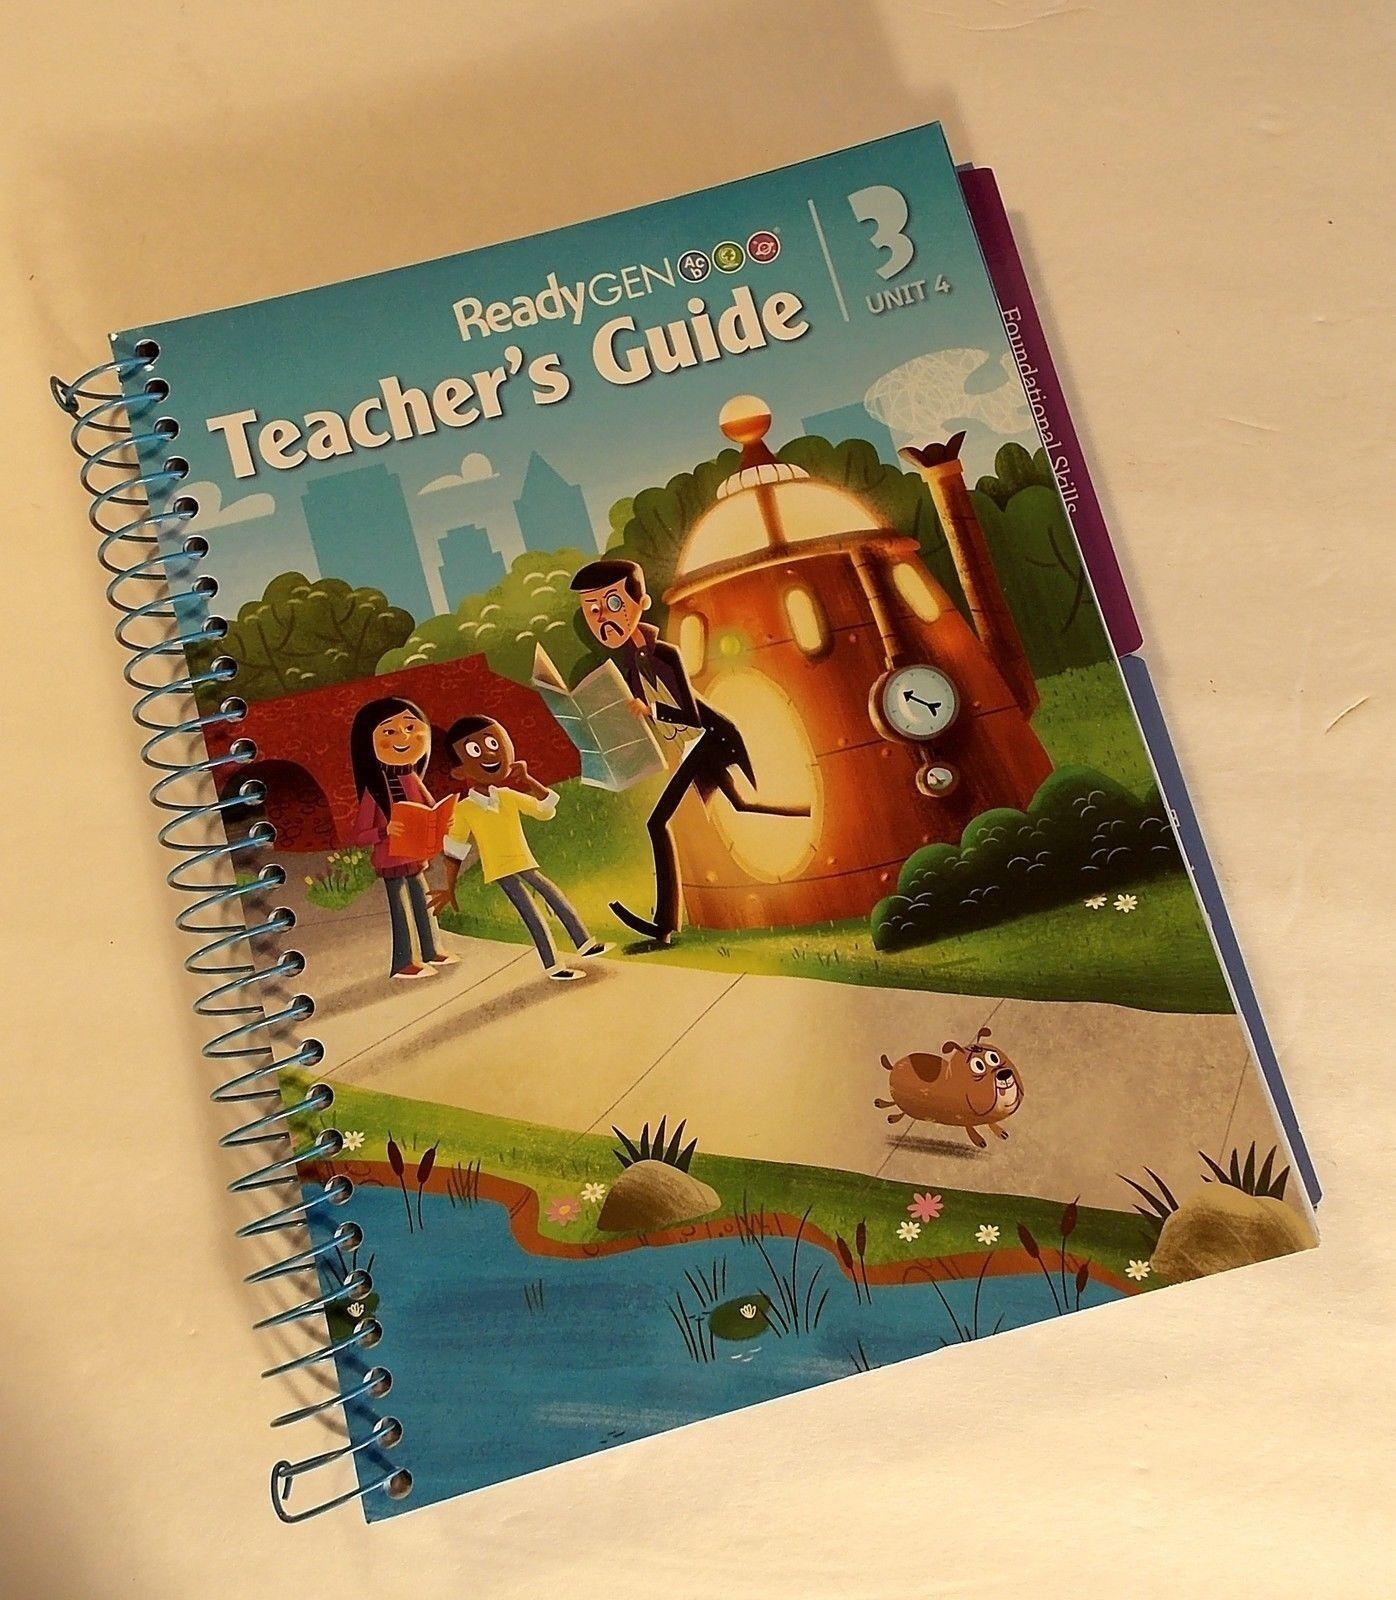 readygen teachers guide grade 3 unit 4 common core 9780328851973 rh ebay com readygen grade 4 teacher's guide unit 3 ReadyGEN First Grade